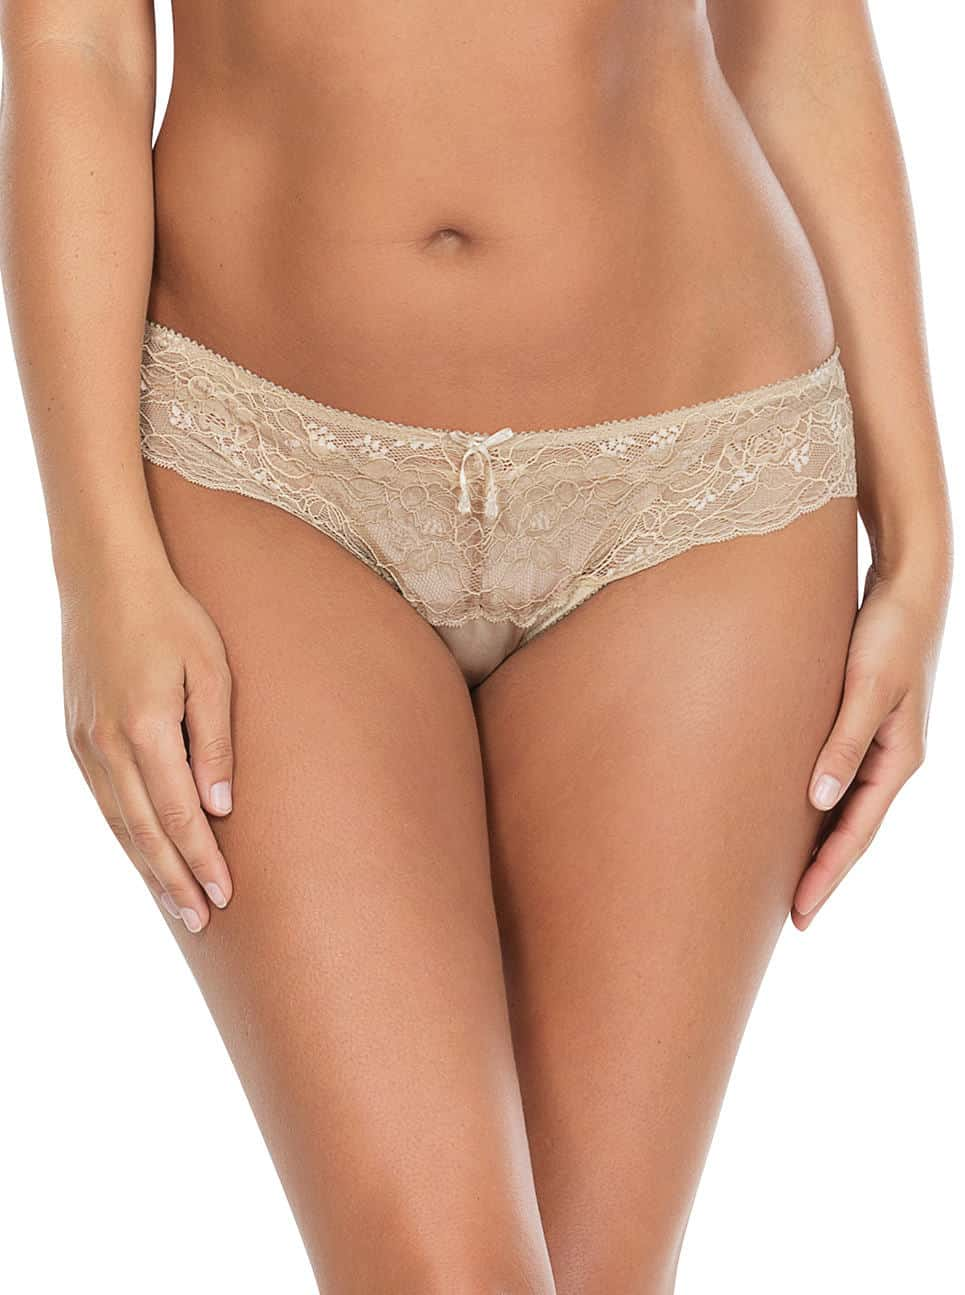 Elissa BikiniP5013 ENude Front2 - Elissa Bikini - European Nude - P5013